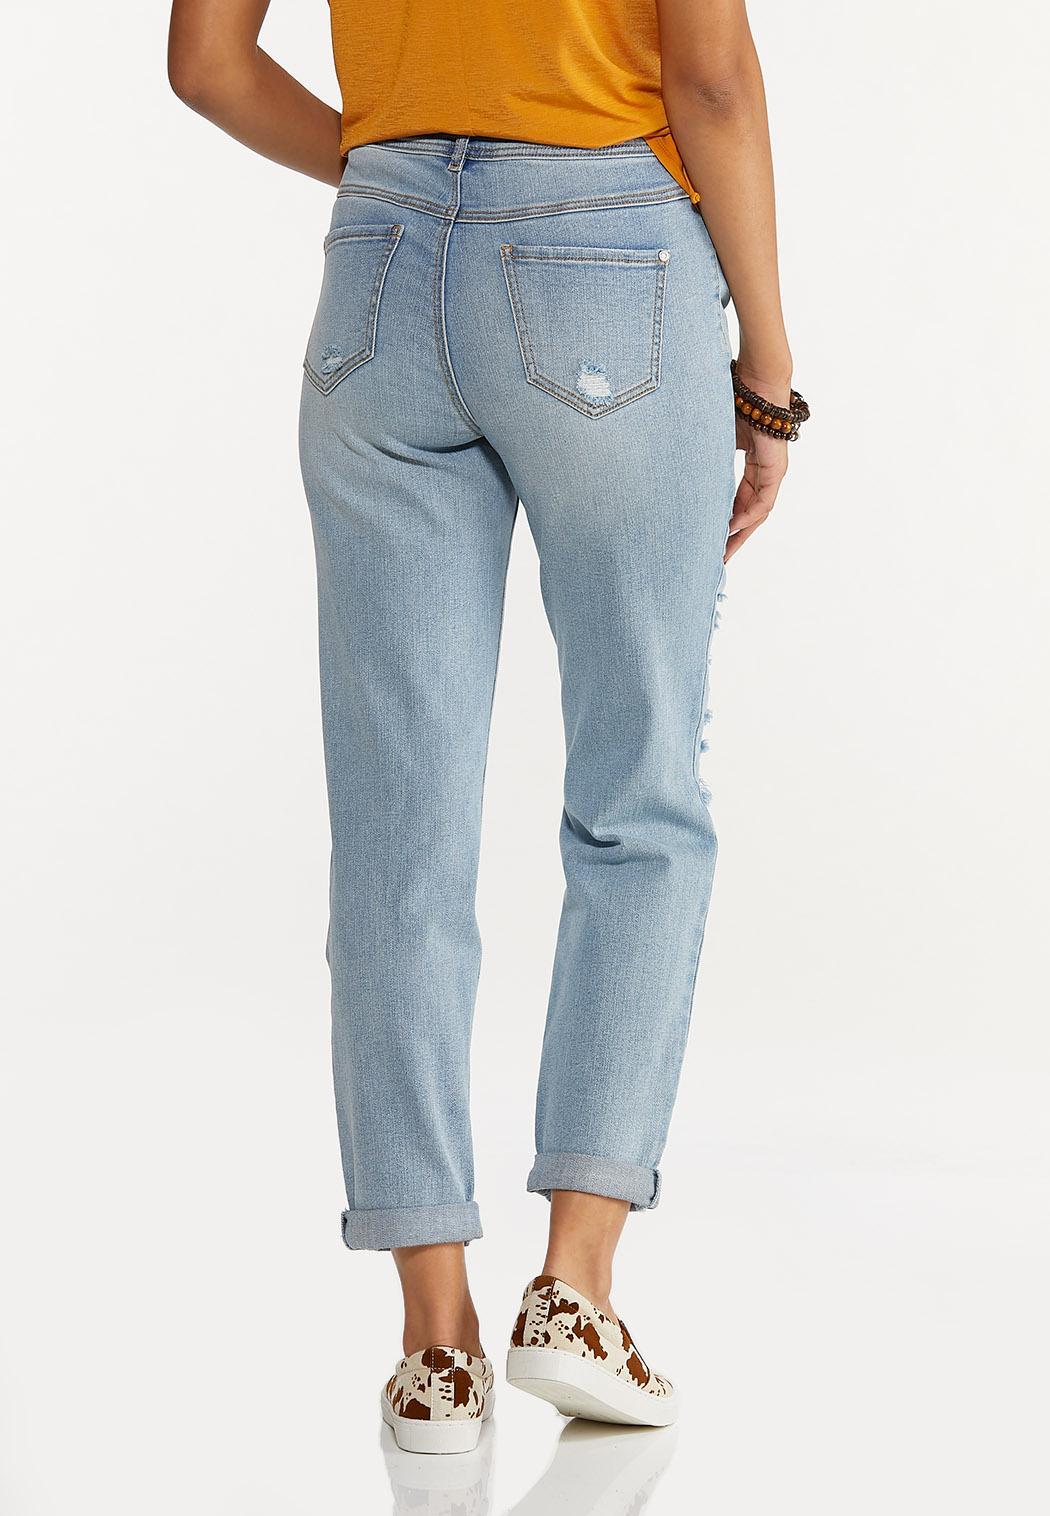 Distressed Boyfriend Jeans (Item #44639730)